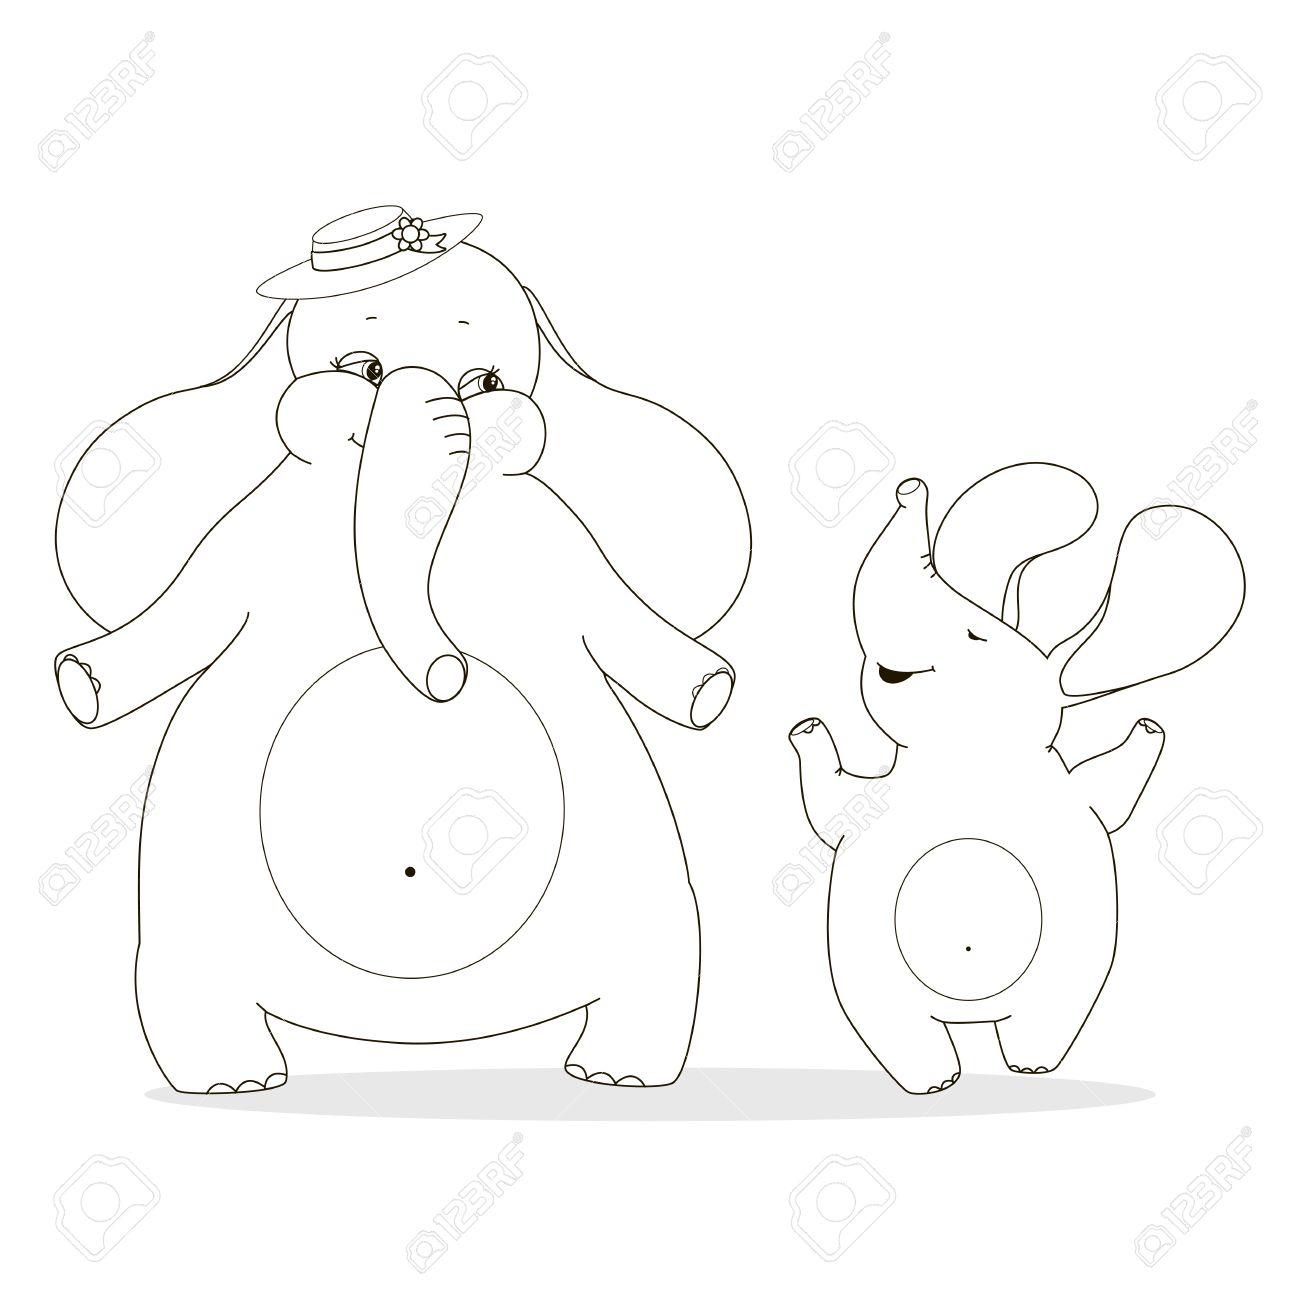 1300x1300 Mother Elephant And Baby Elephant Enjoyed. Family Outline Drawing